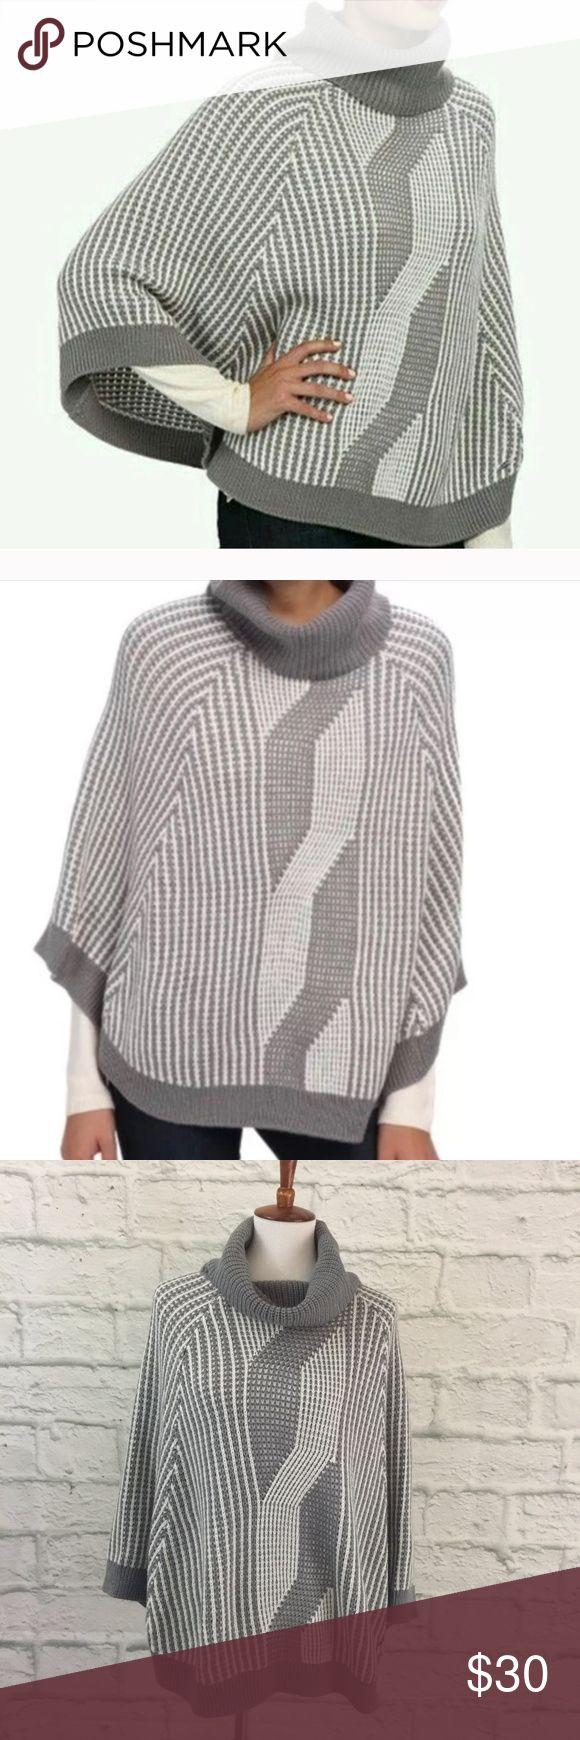 "Calvin Klein Poncho ▻ Calvin Klein Poncho ▻ Cozy knit striped cowl-neck poncho w/ geometric design ▻ Approximately 24"" shoulder to bottom hem ▻ 100% acrylic ▻ Machine wash, dry flat ▻ EUC Calvin Klein Sweaters Shrugs & Ponchos"